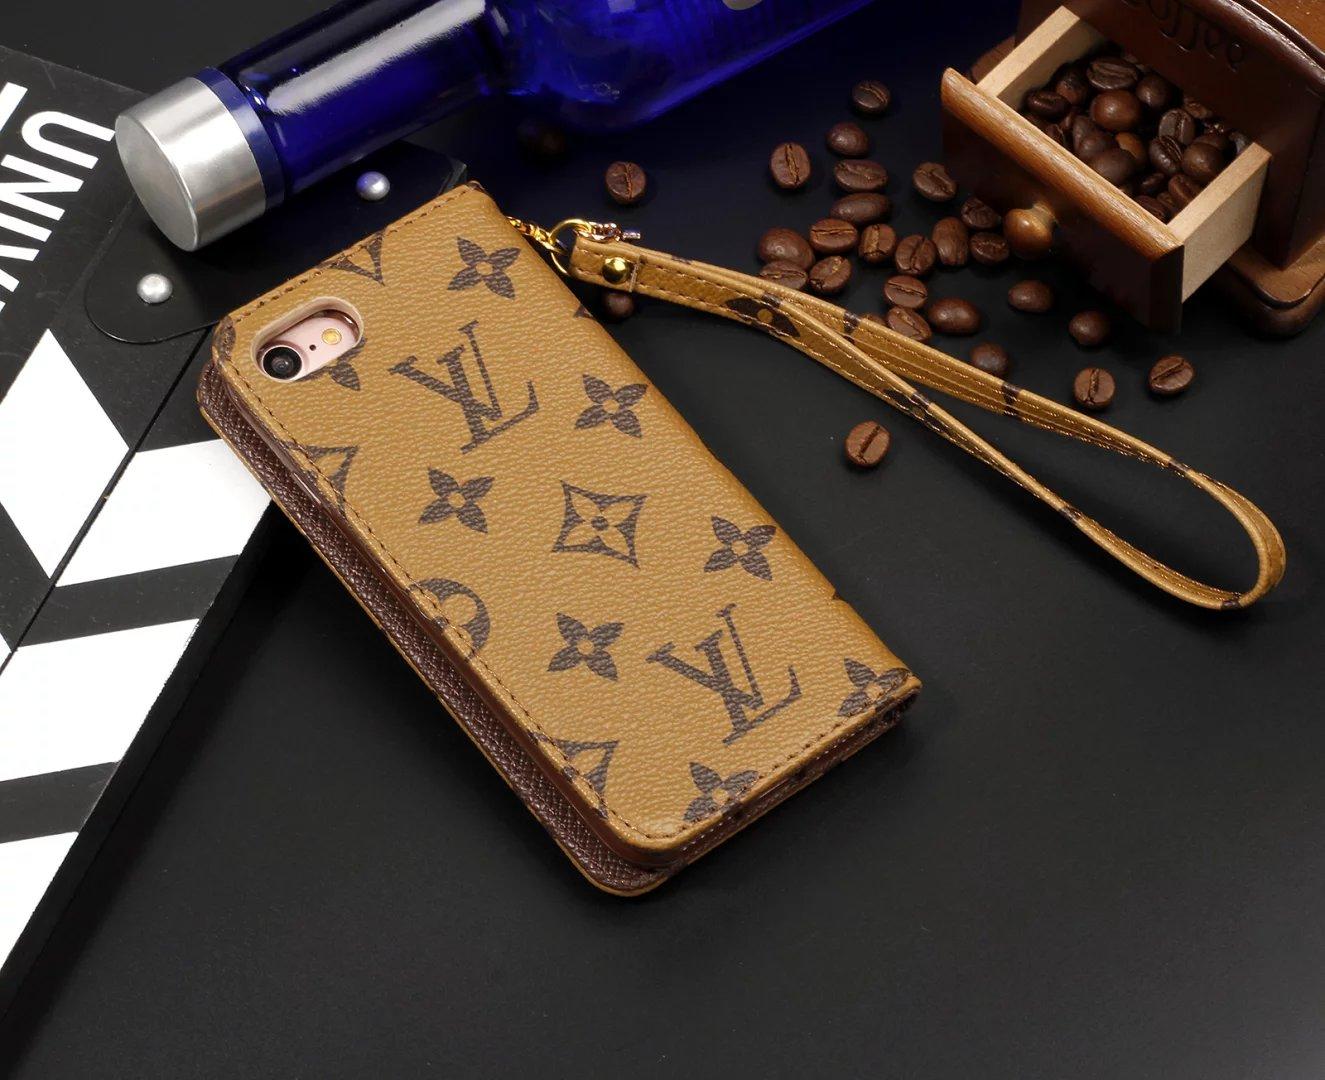 iphone silikonhülle beste iphone hülle Louis Vuitton iphone6 hülle foto handyschale eigene hülle erstellen iphone 6 filztasche etui für iphone 6 iphone 6 a6 rot htc handyhülle 6lbst gestalten